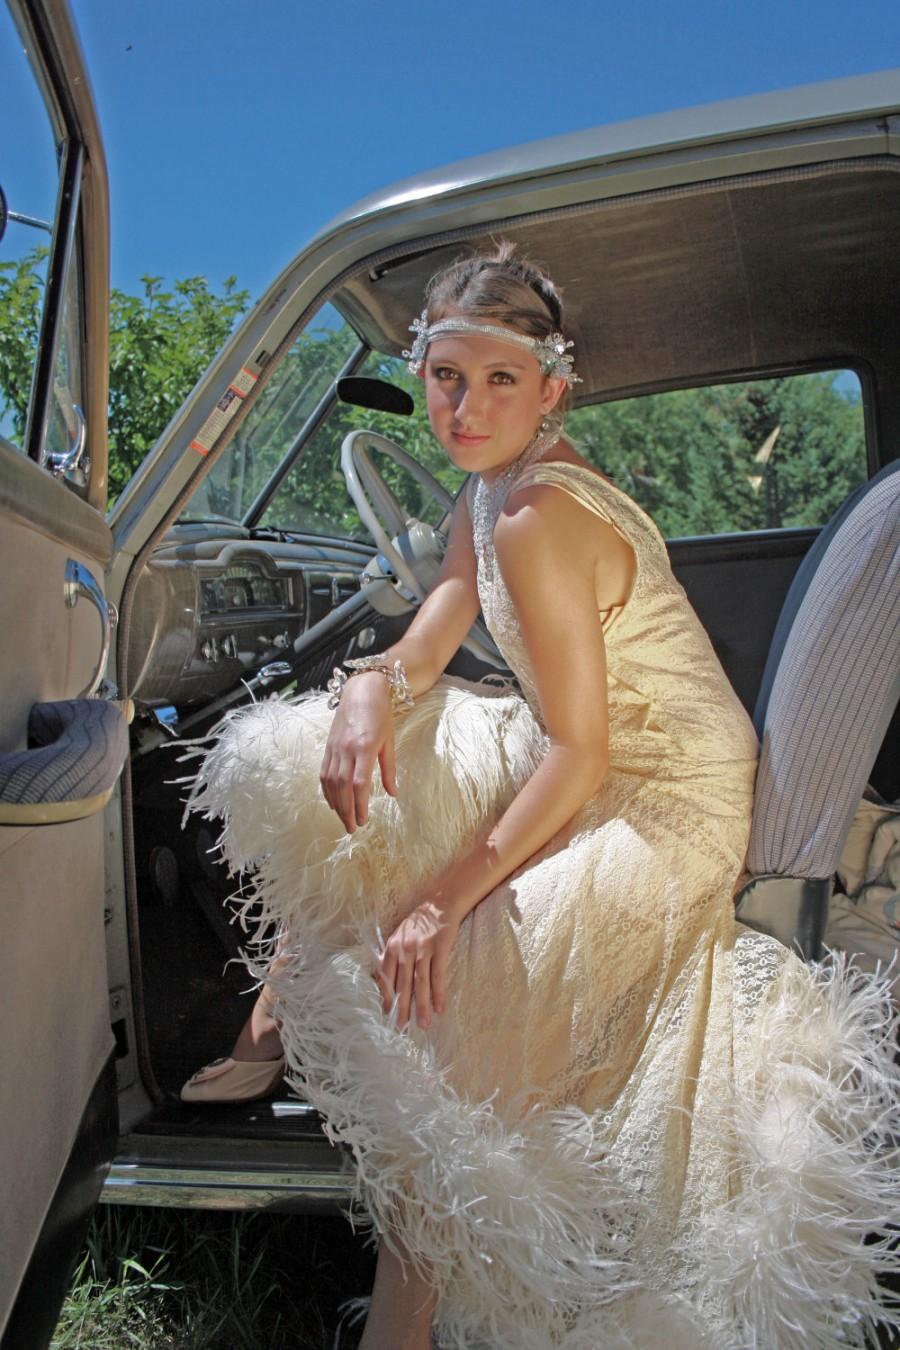 Wedding - Vintage Wedding Gown 1920s inspired Roaring 20s Flapper Dress